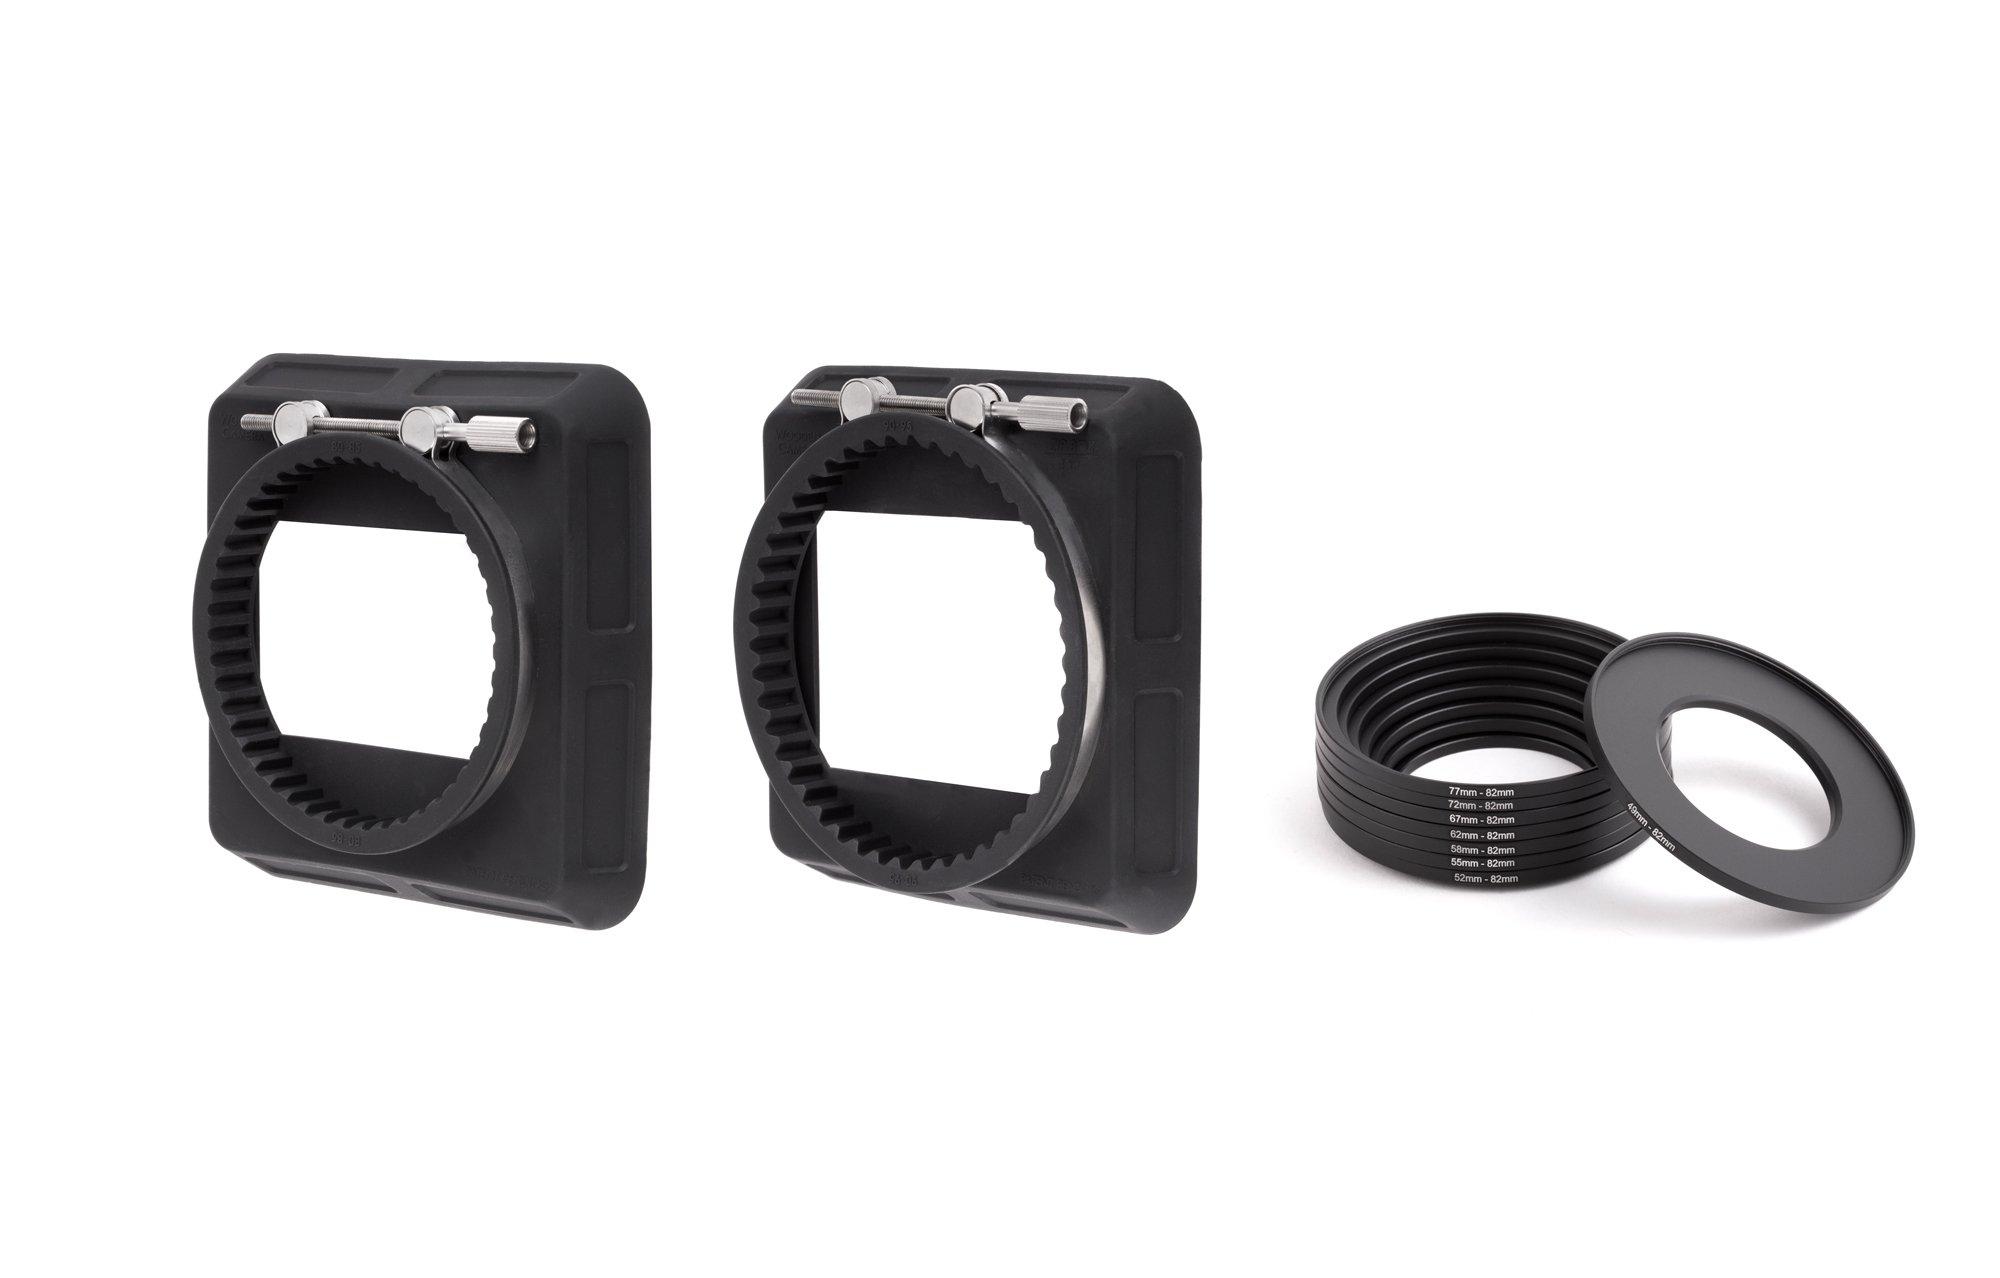 Wooden Camera - Zip Box Kit 4x4 (80-85mm, 90-95mm, Adapter Rings)